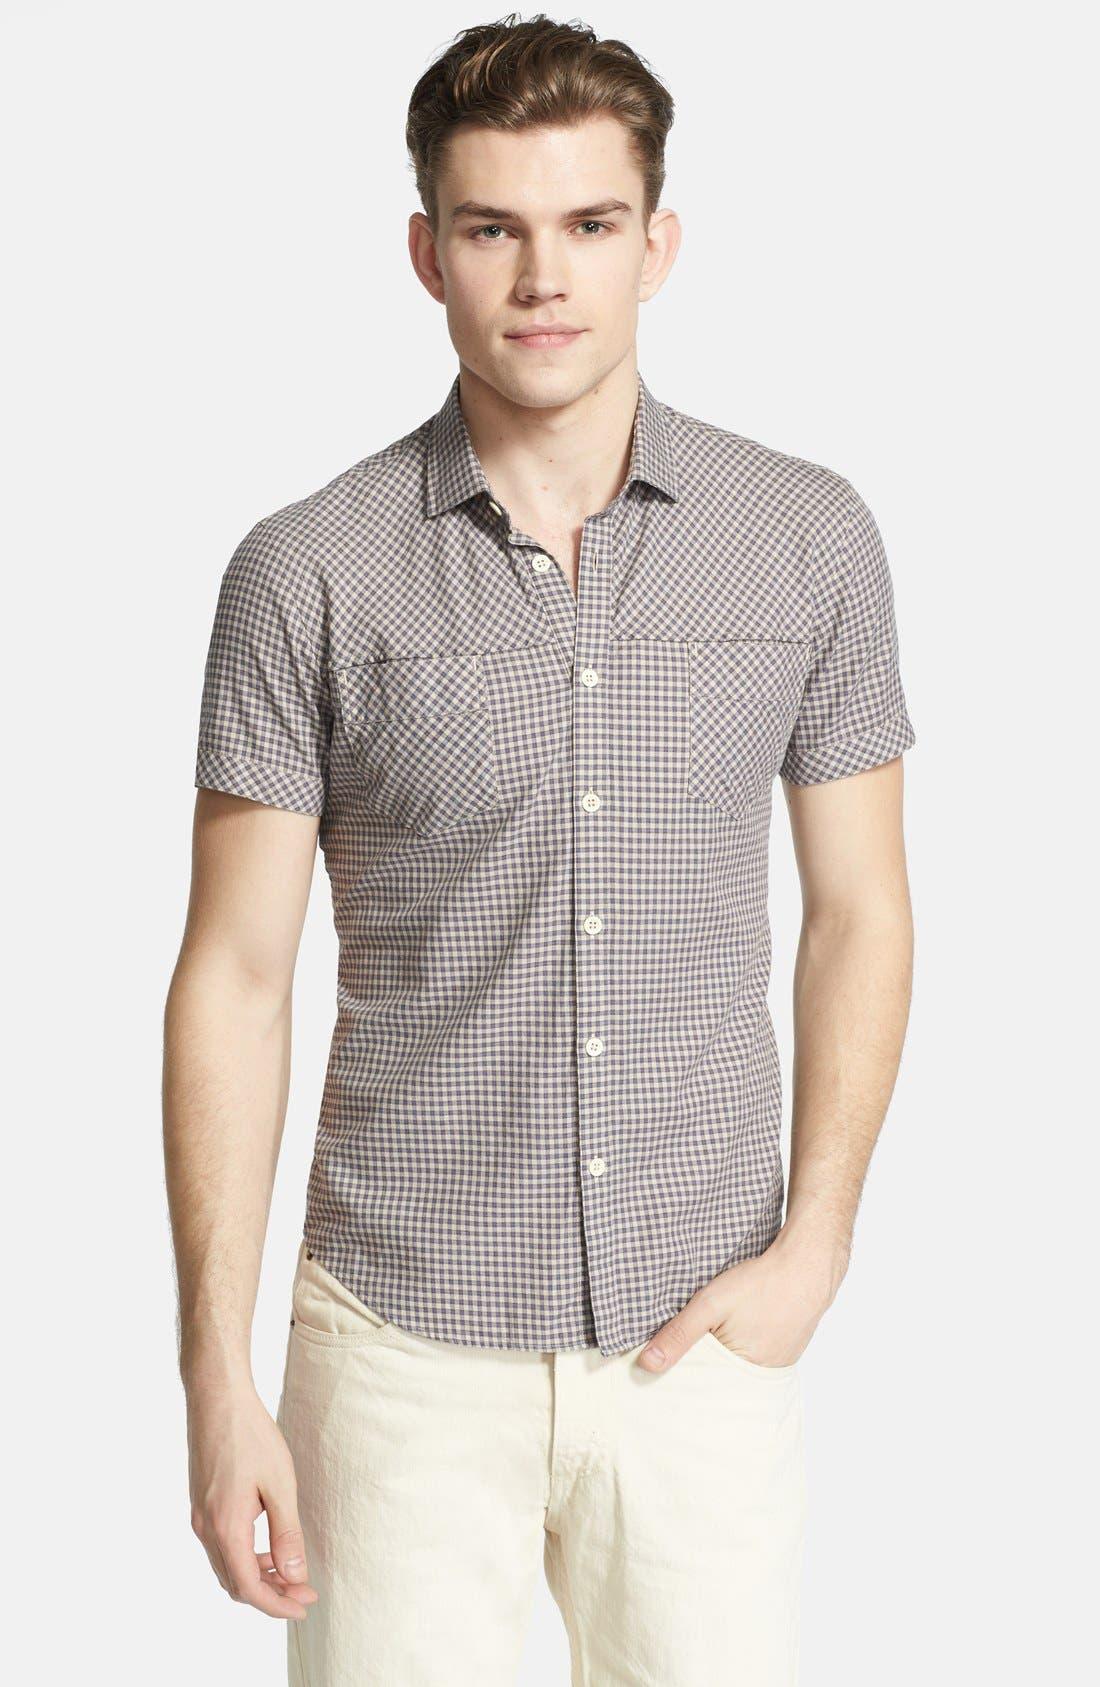 Alternate Image 1 Selected - Billy Reid 'Courtland' Check Short Sleeve Shirt